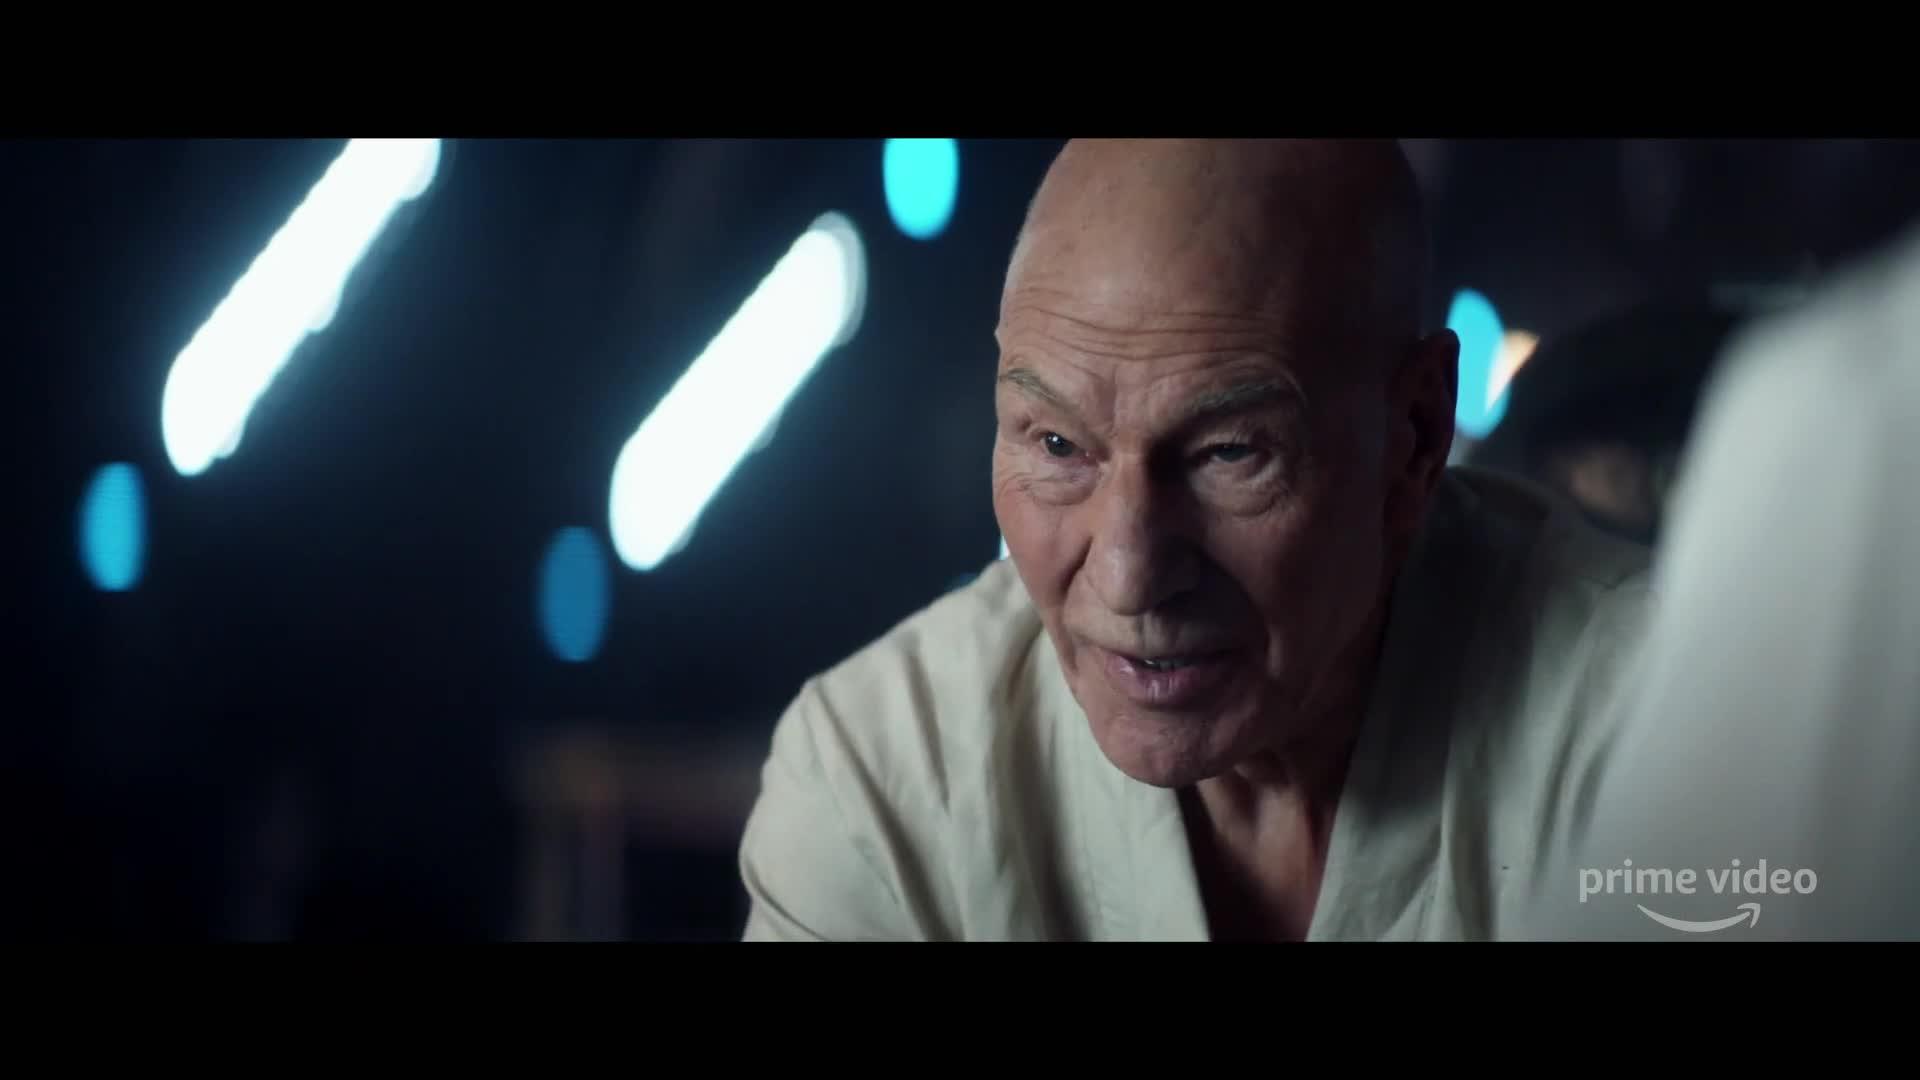 Trailer, Amazon, Serie, Amazon Prime, Amazon Prime Video, Teaser, Star Trek, Prime Video, Jean Luc Picard, Picard, Star Trek Picard, Star Trek:Picard